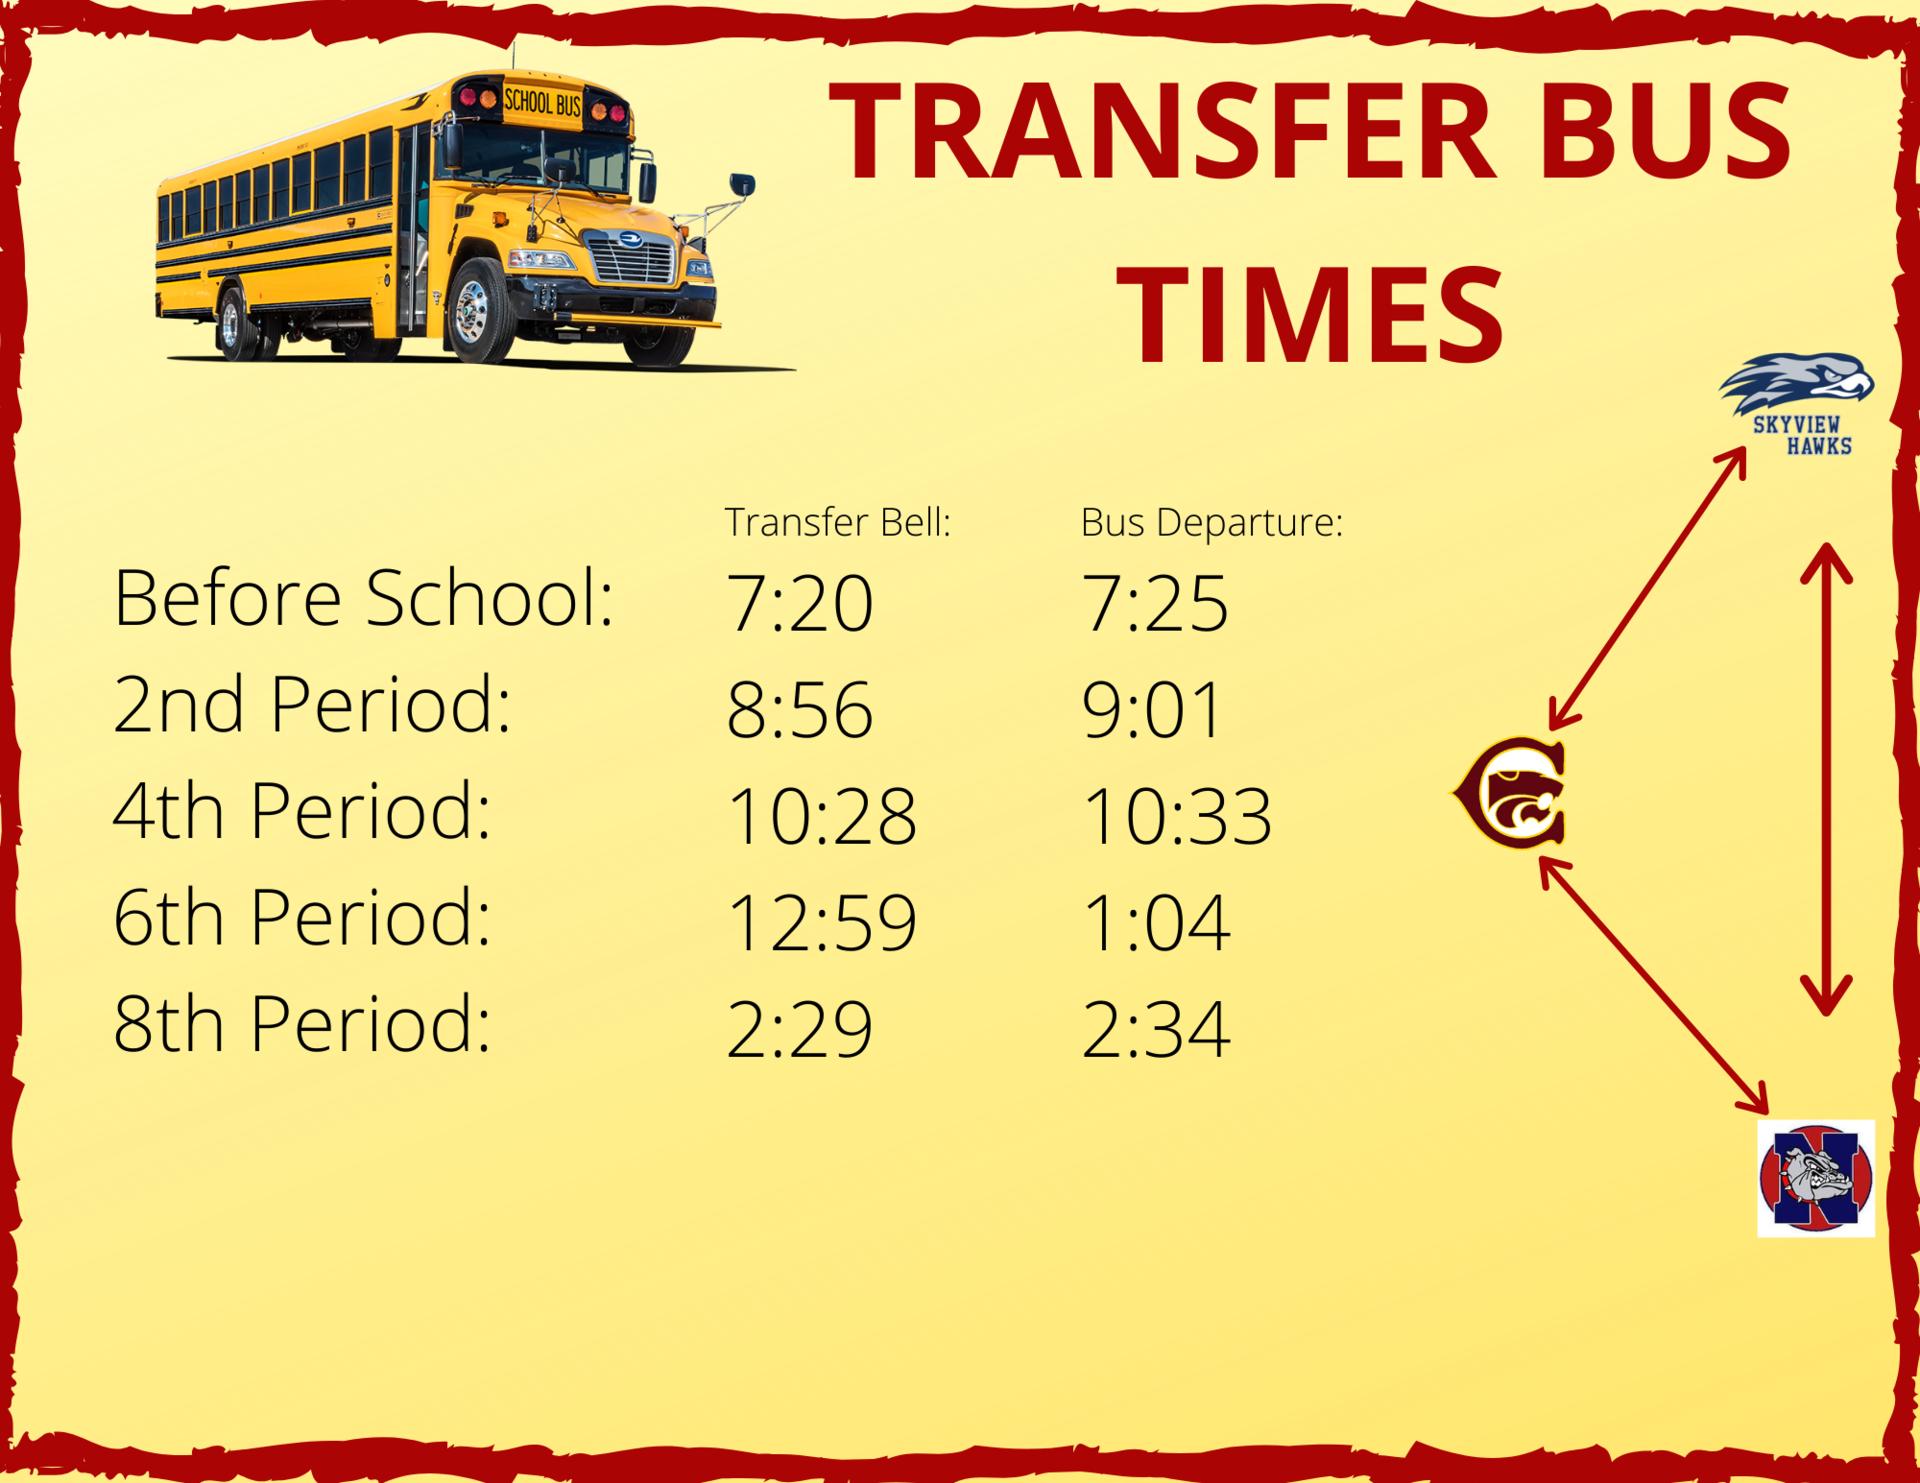 Transfer Bus Times